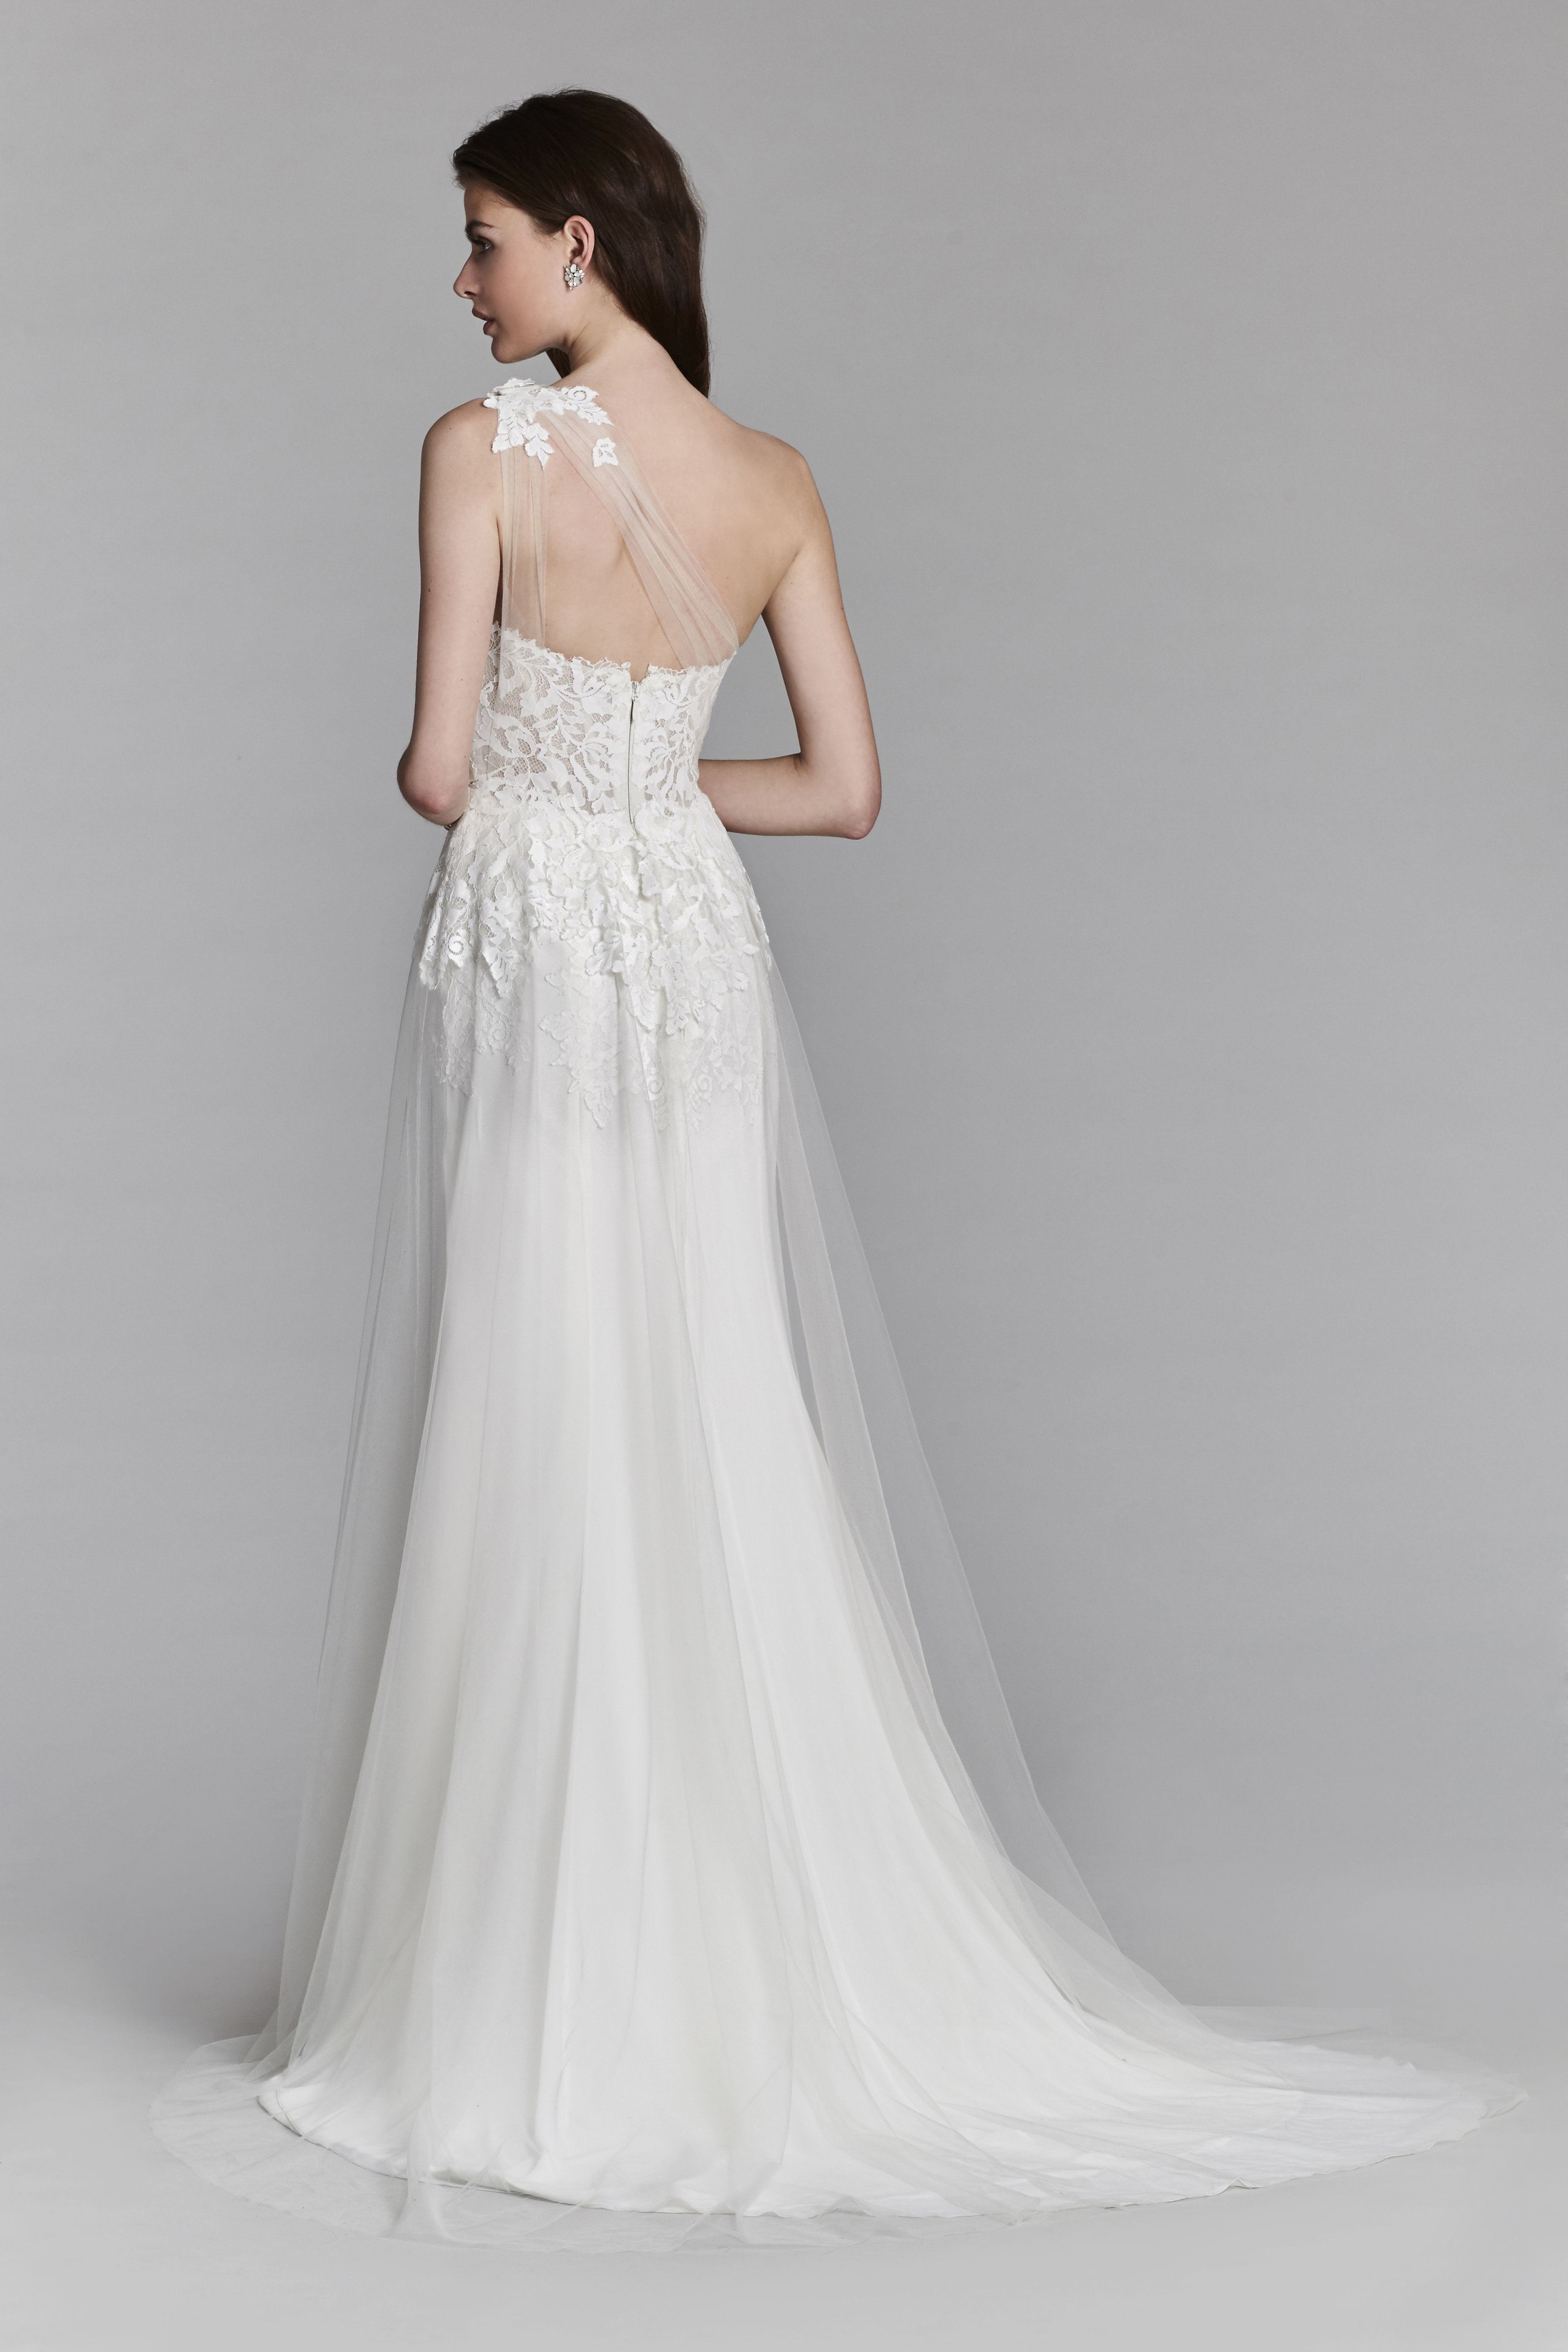 Jim hjelm wedding dresses ireland - Dress collection 2018